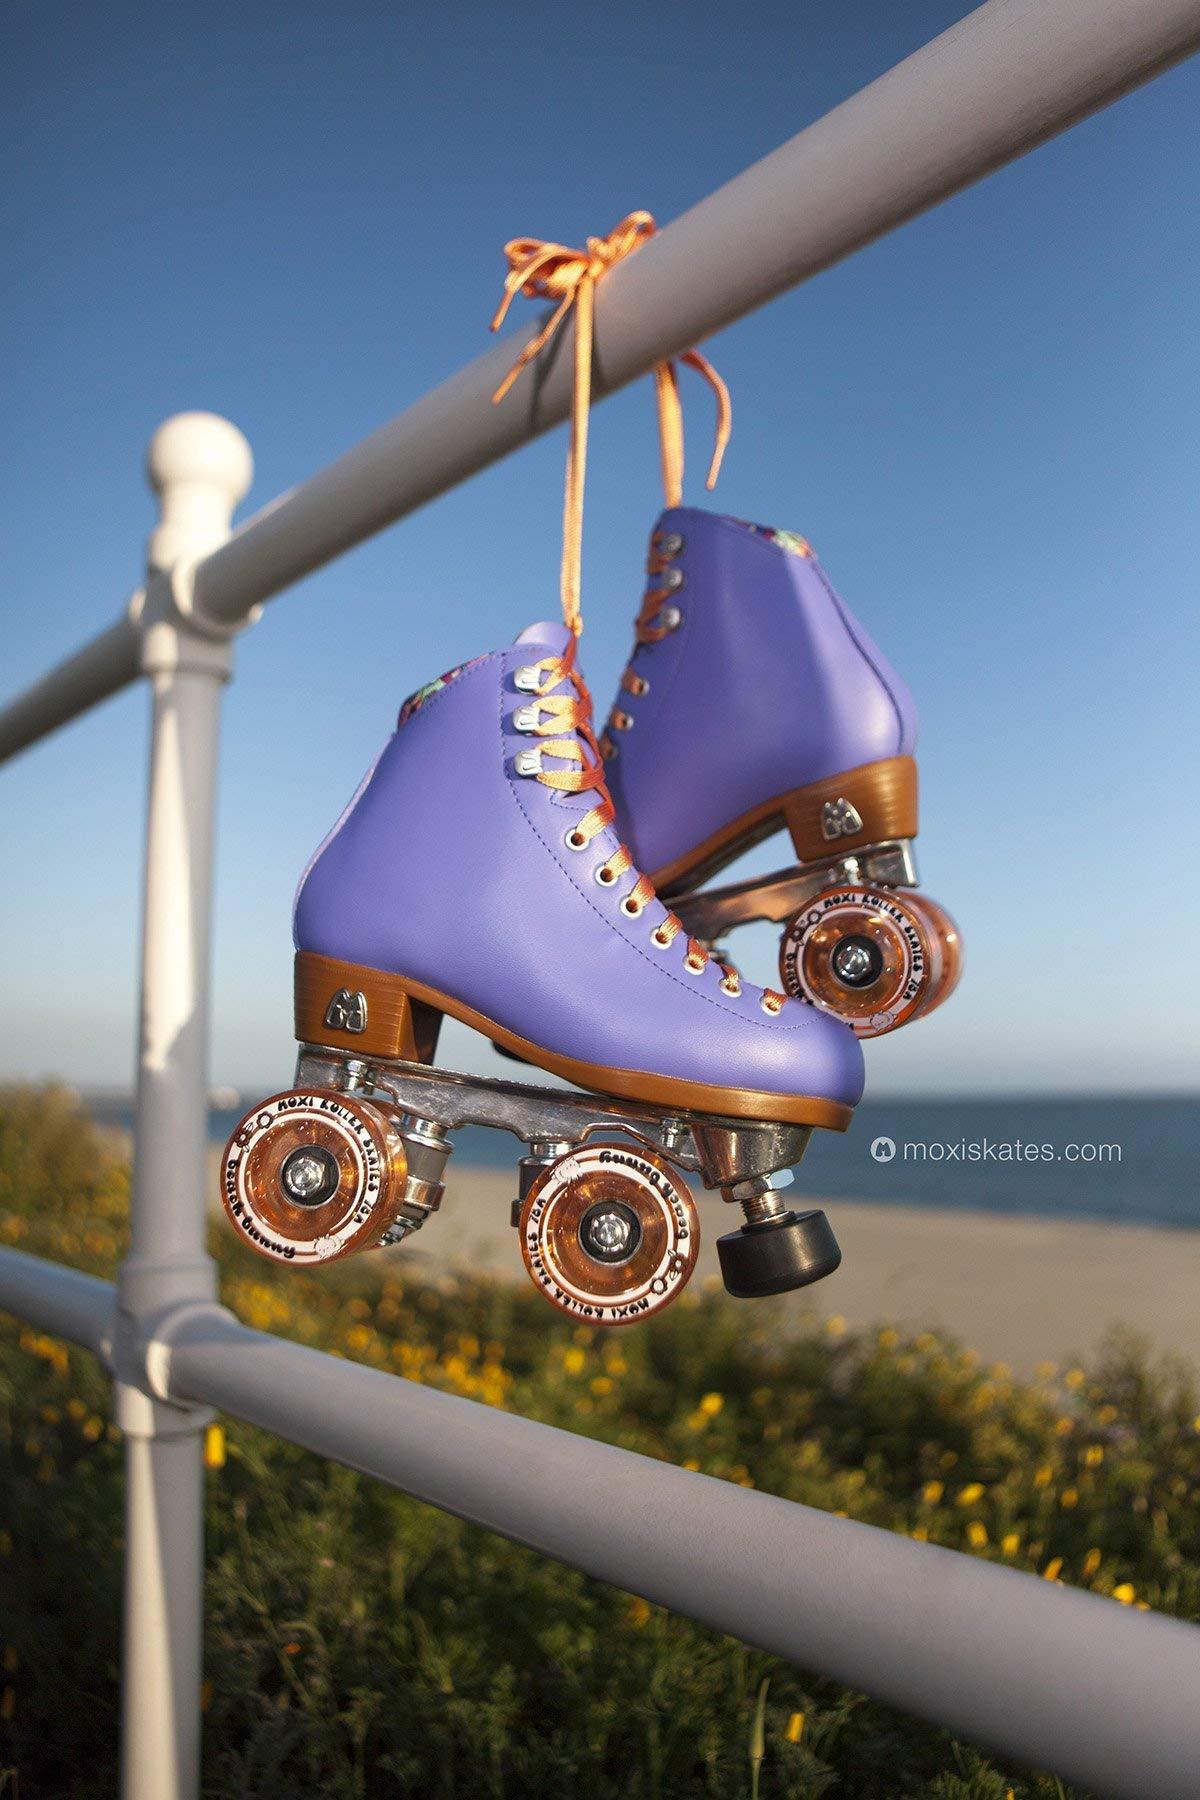 Moxi Skates - Beach Bunny - Fashionable Womens Roller Skates | Periwinkle Sunset | Size 3 by Moxi (Image #4)